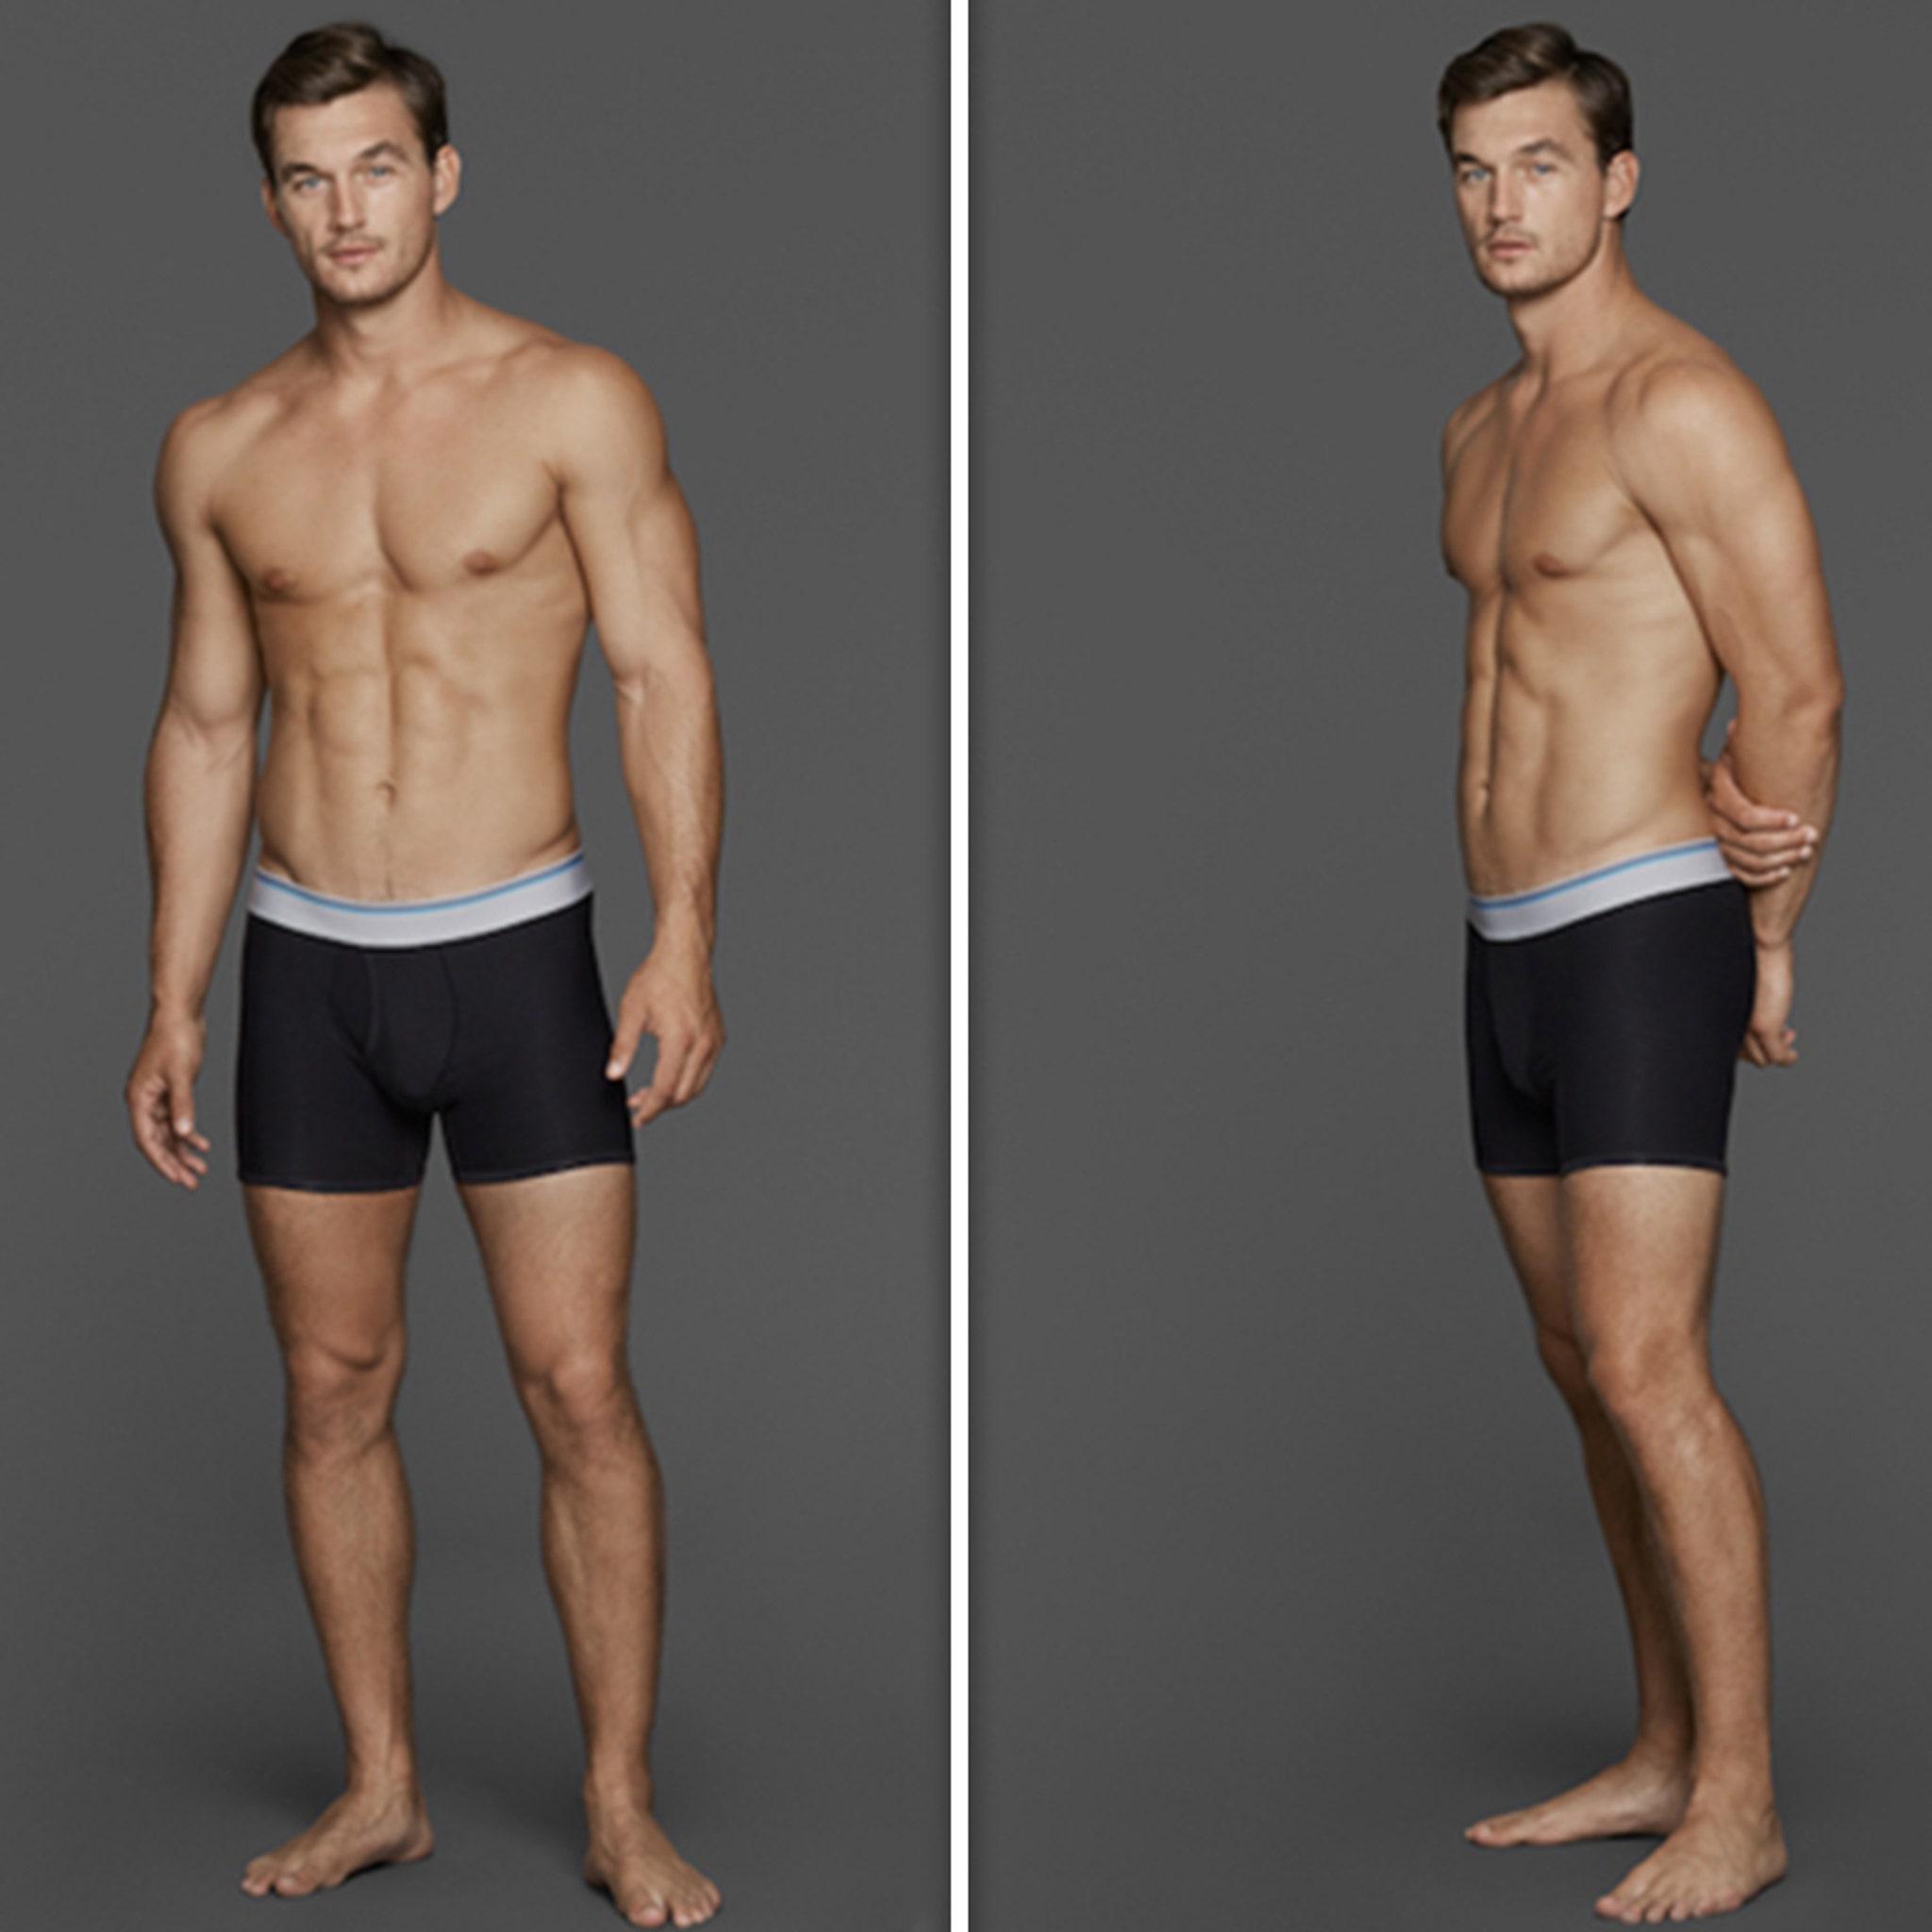 Tyler Cameron Focused on Modeling Underwear Instead of 'Bachelor' Gig